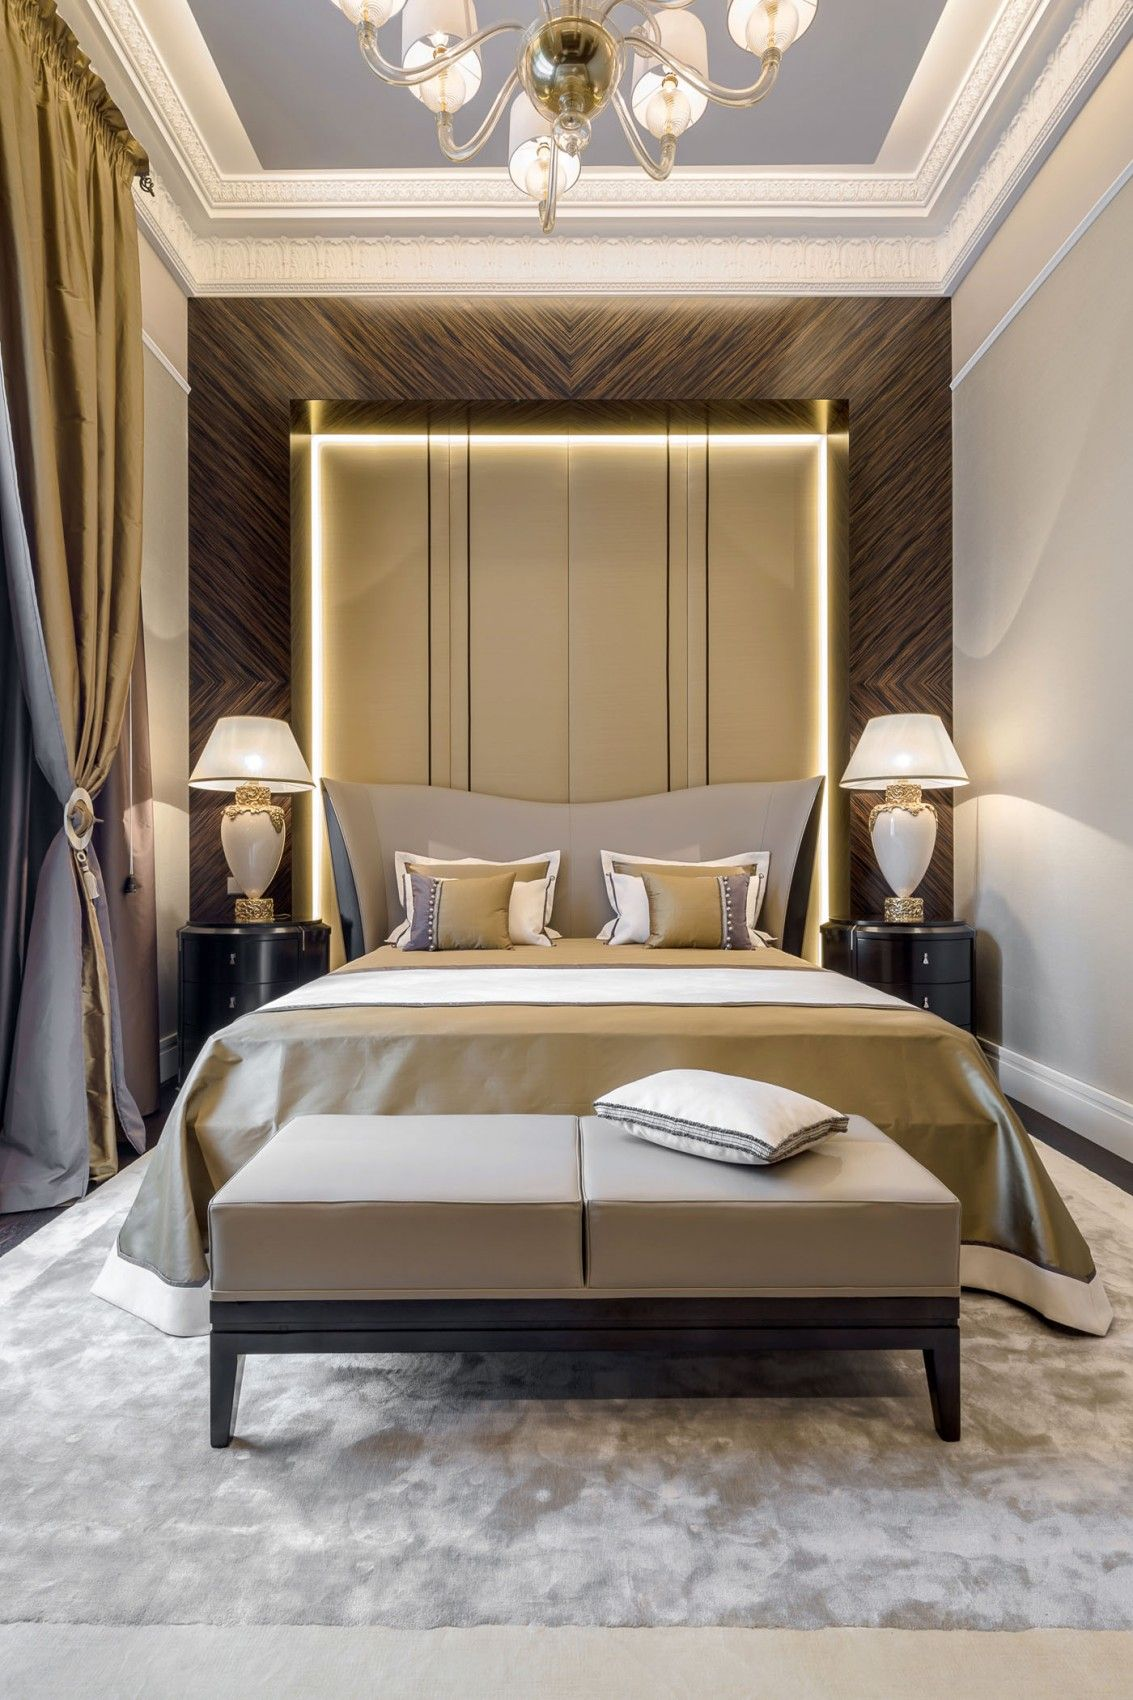 luxury master bedroom decorating ideas master bedroom decorating